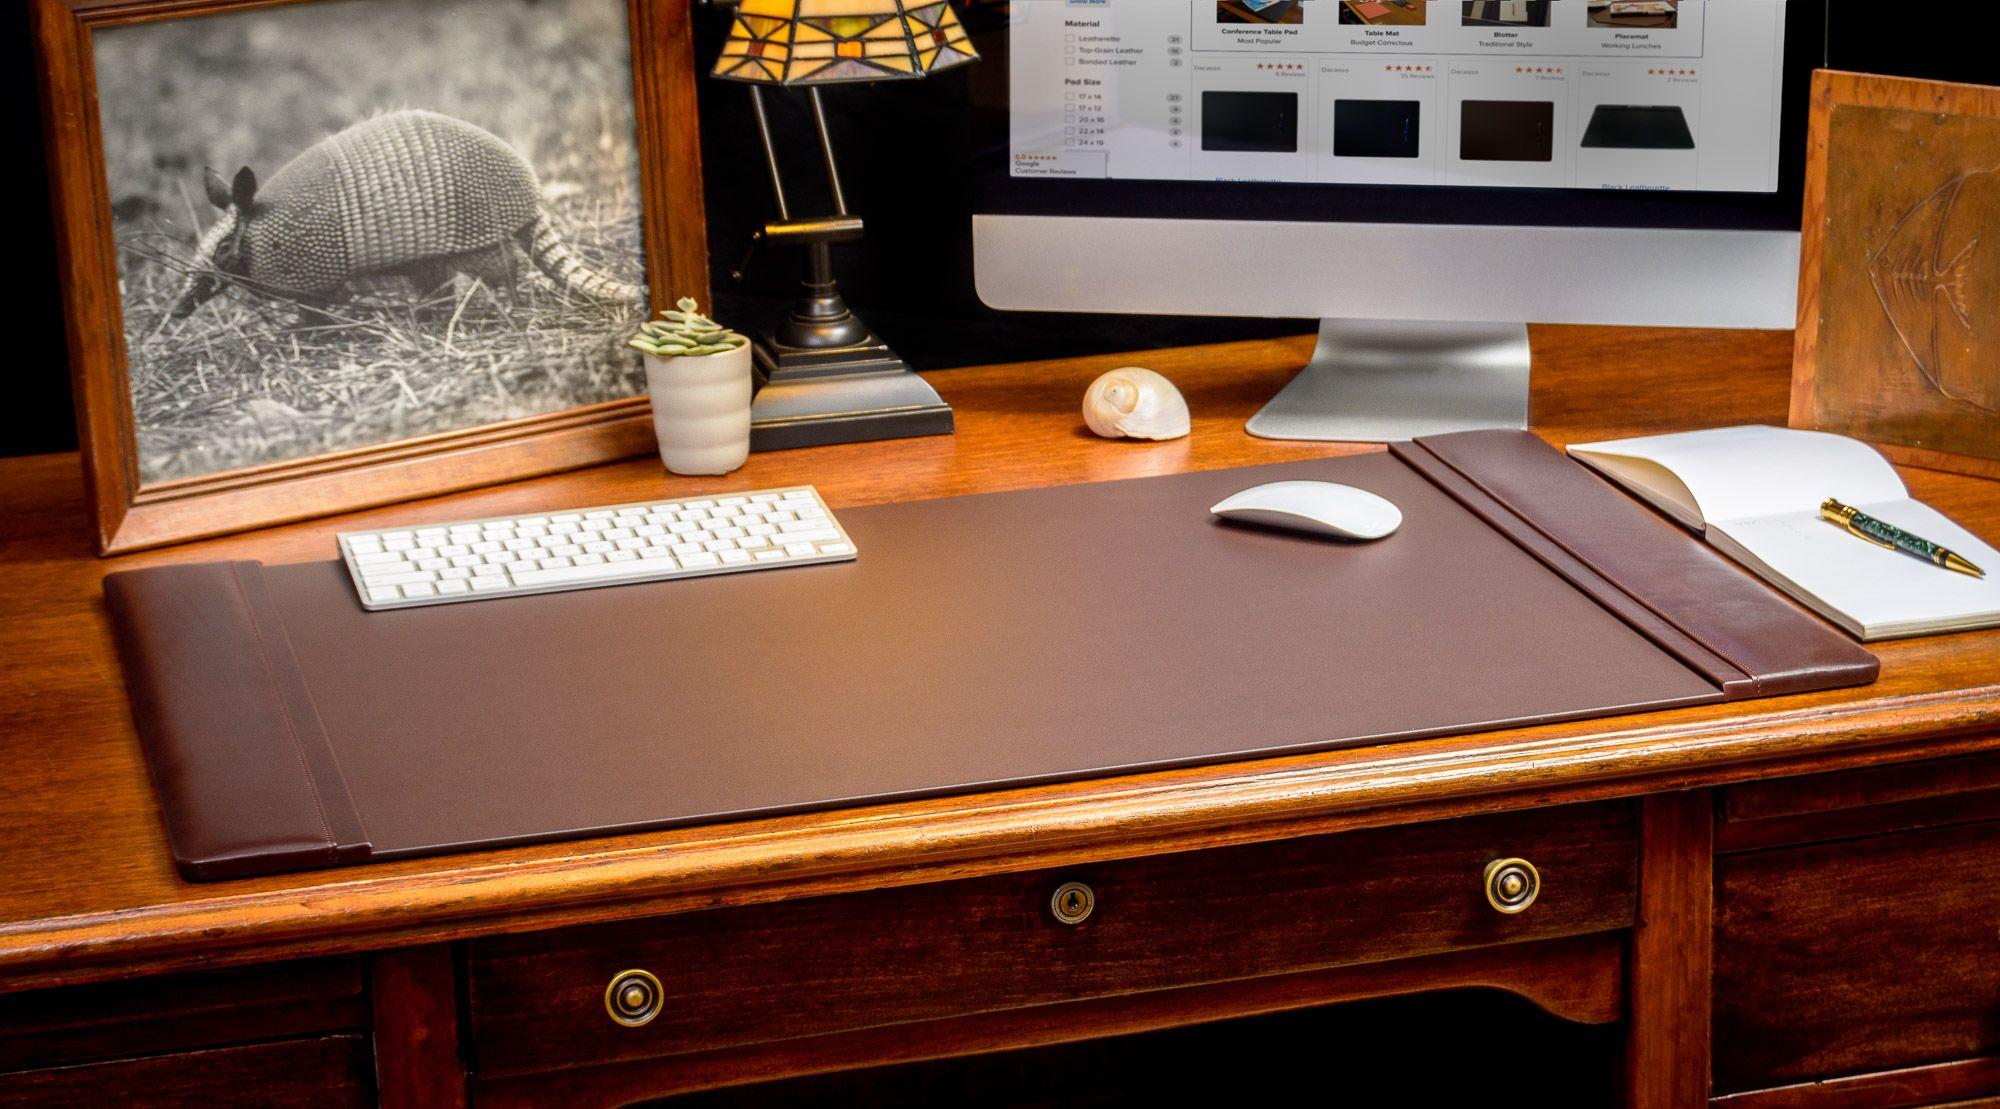 DacassoChocolate Brown (34″ x 20″) Leather Desk Pad